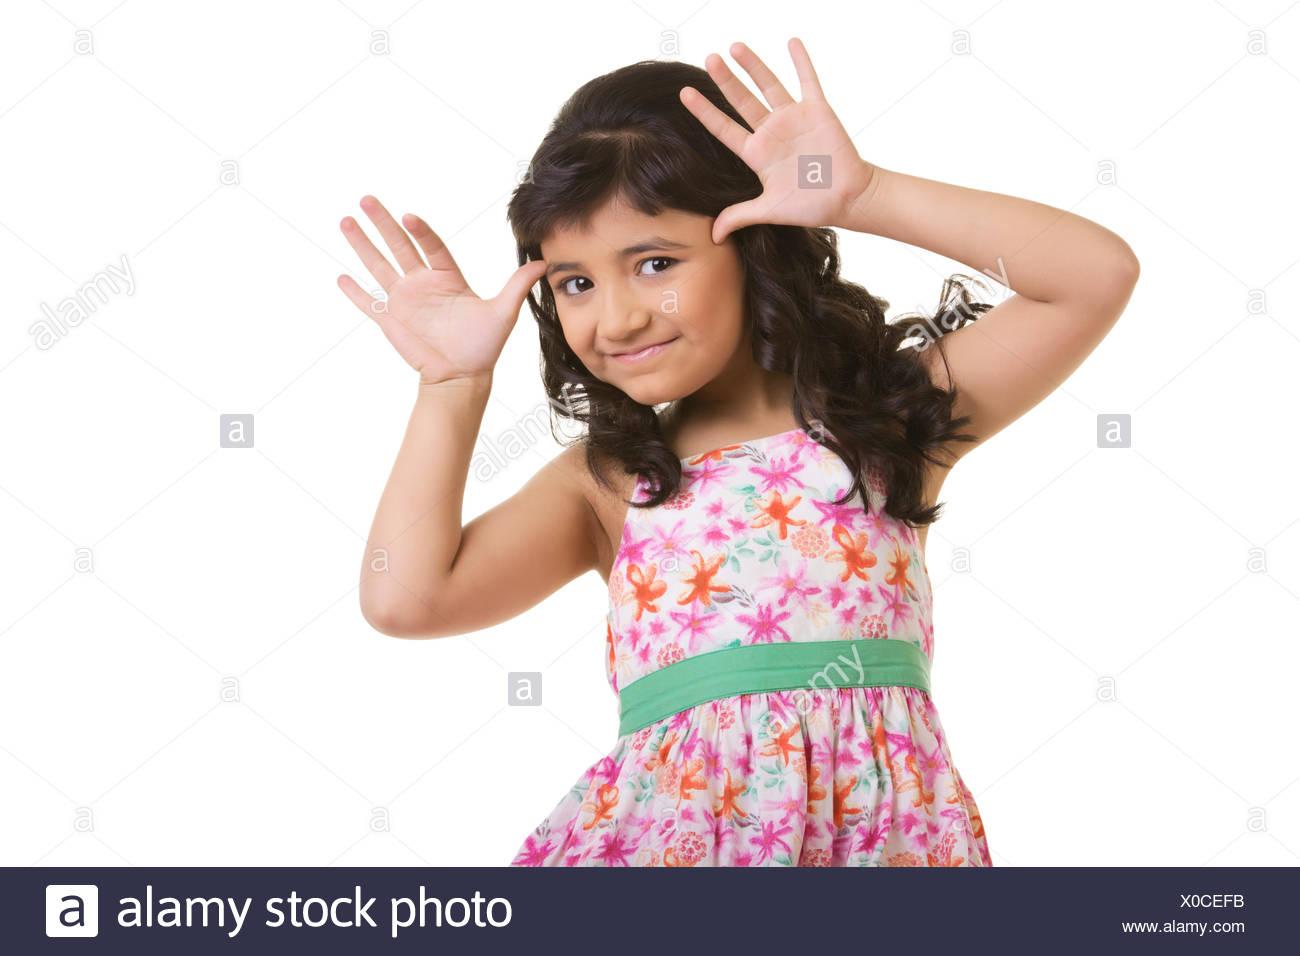 Girl making a teasing face - Stock Image